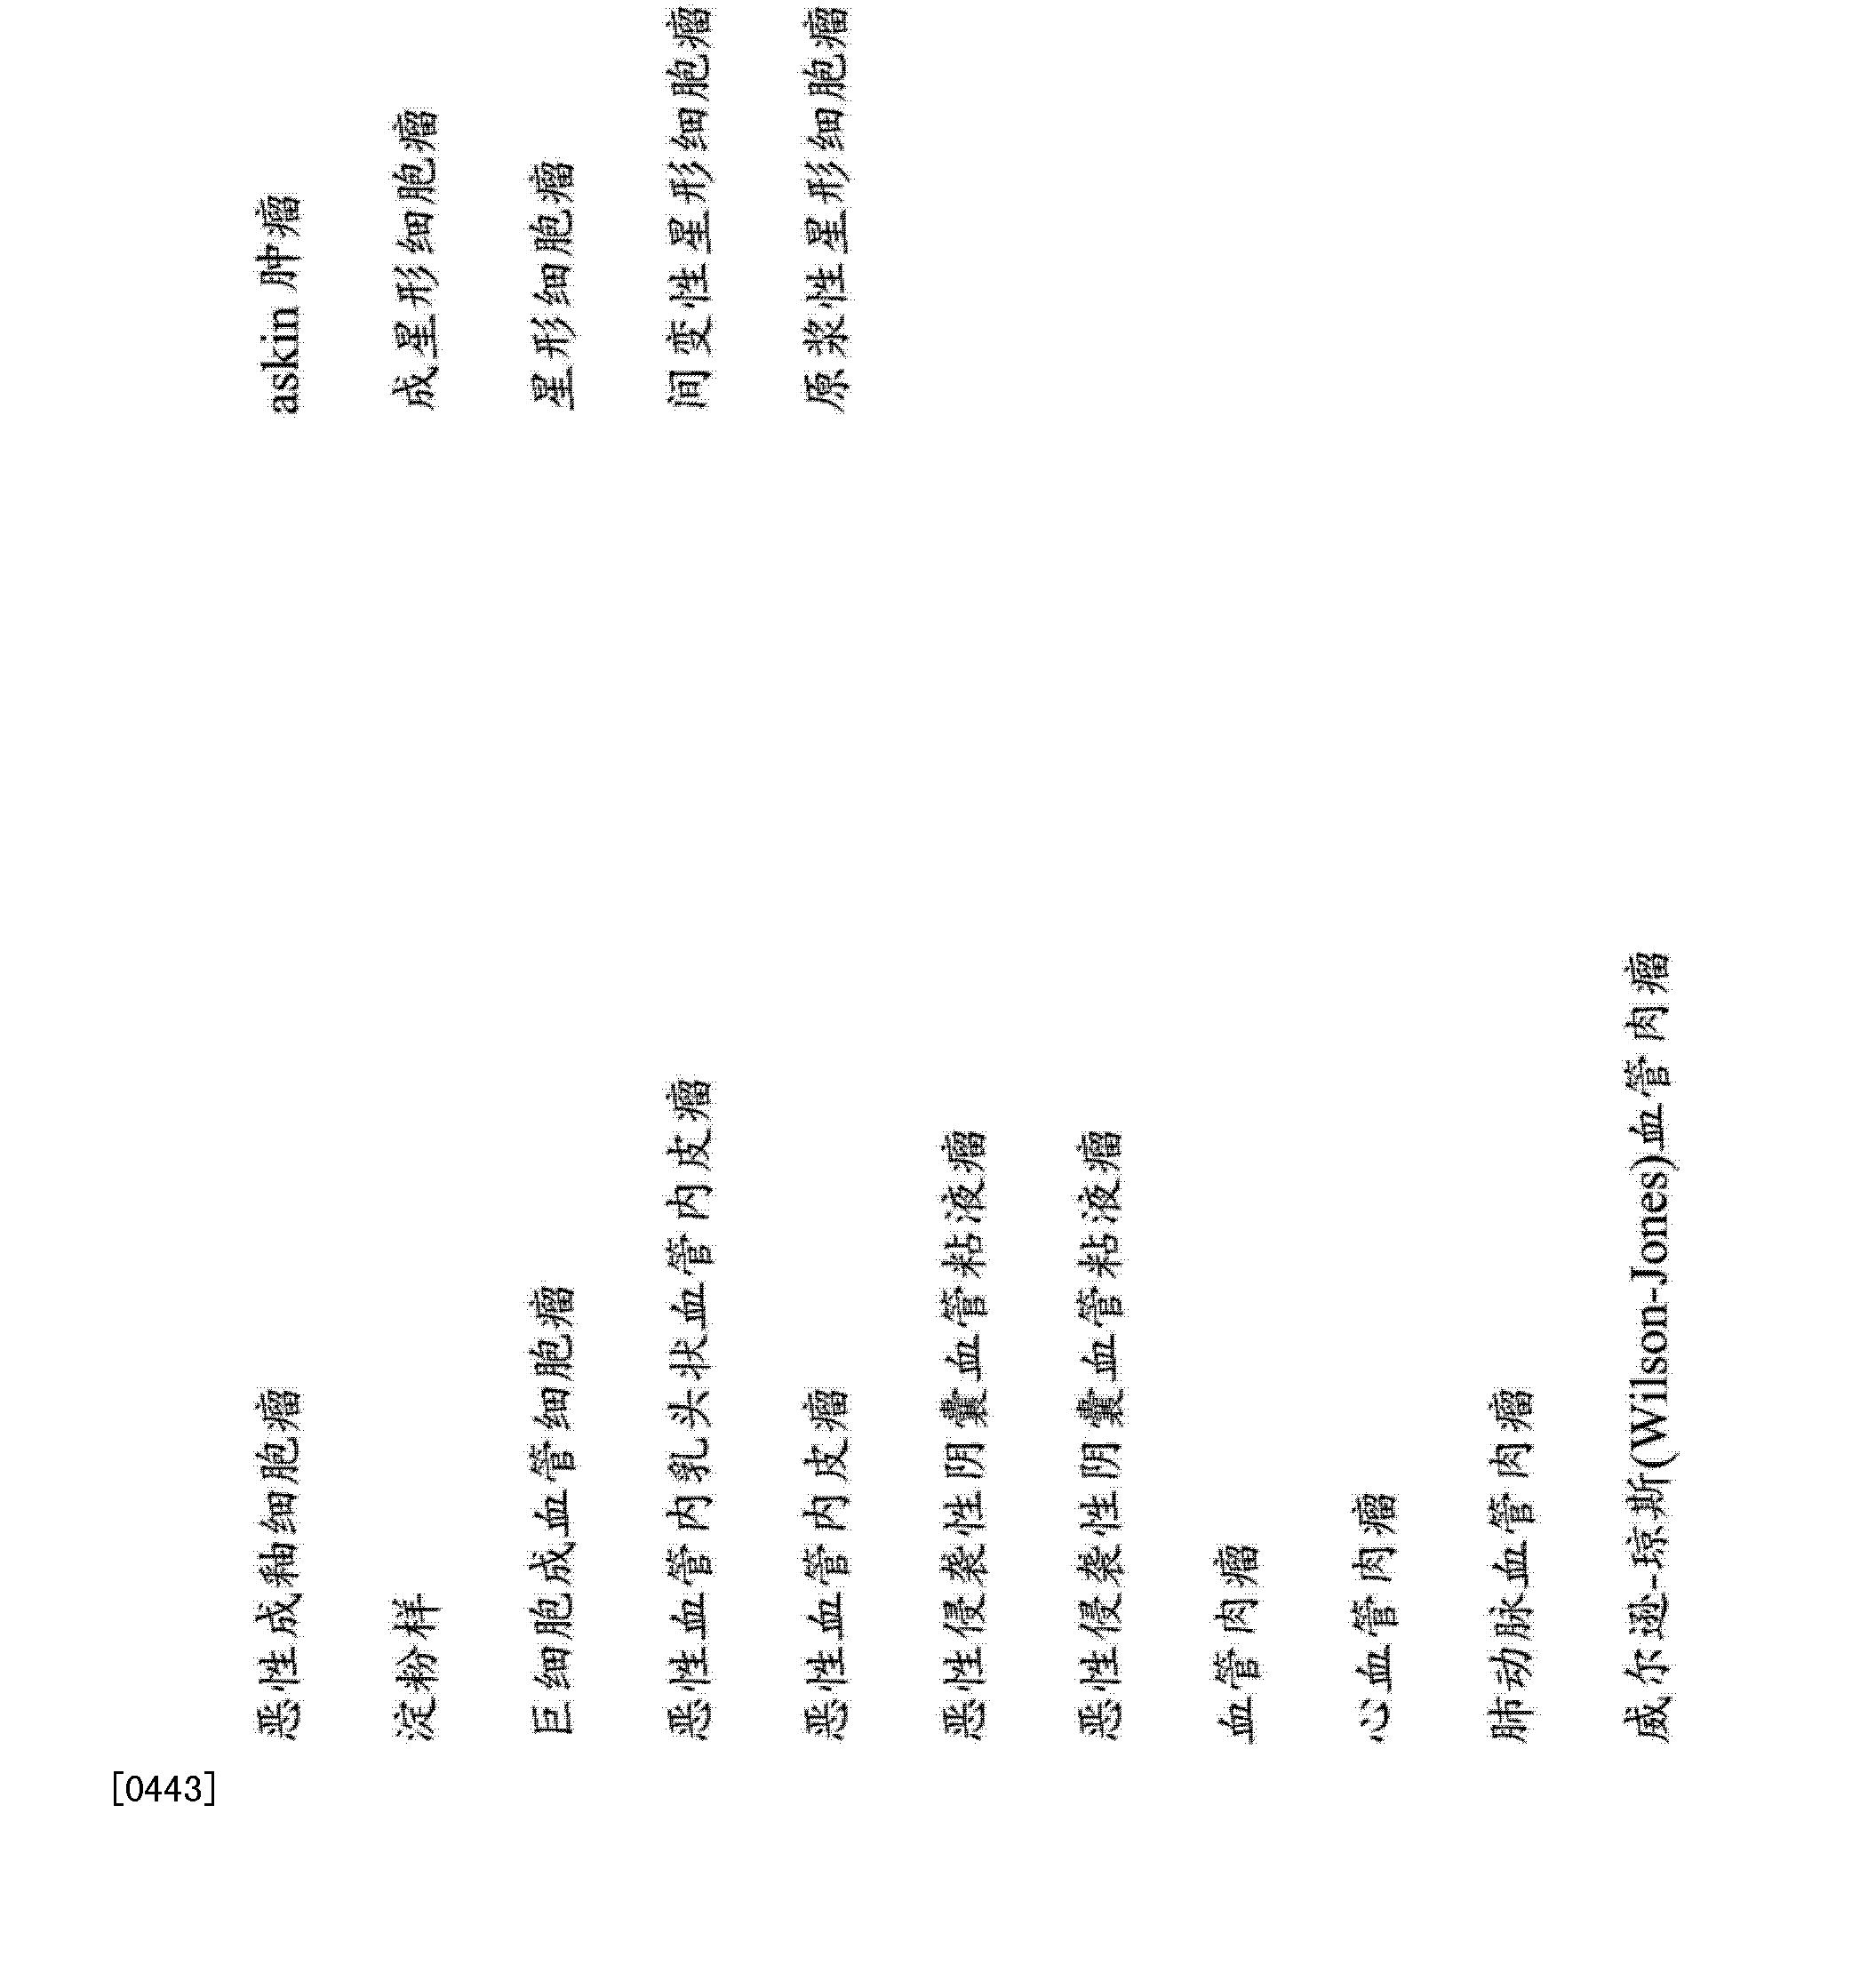 Figure CN103857387AD00561